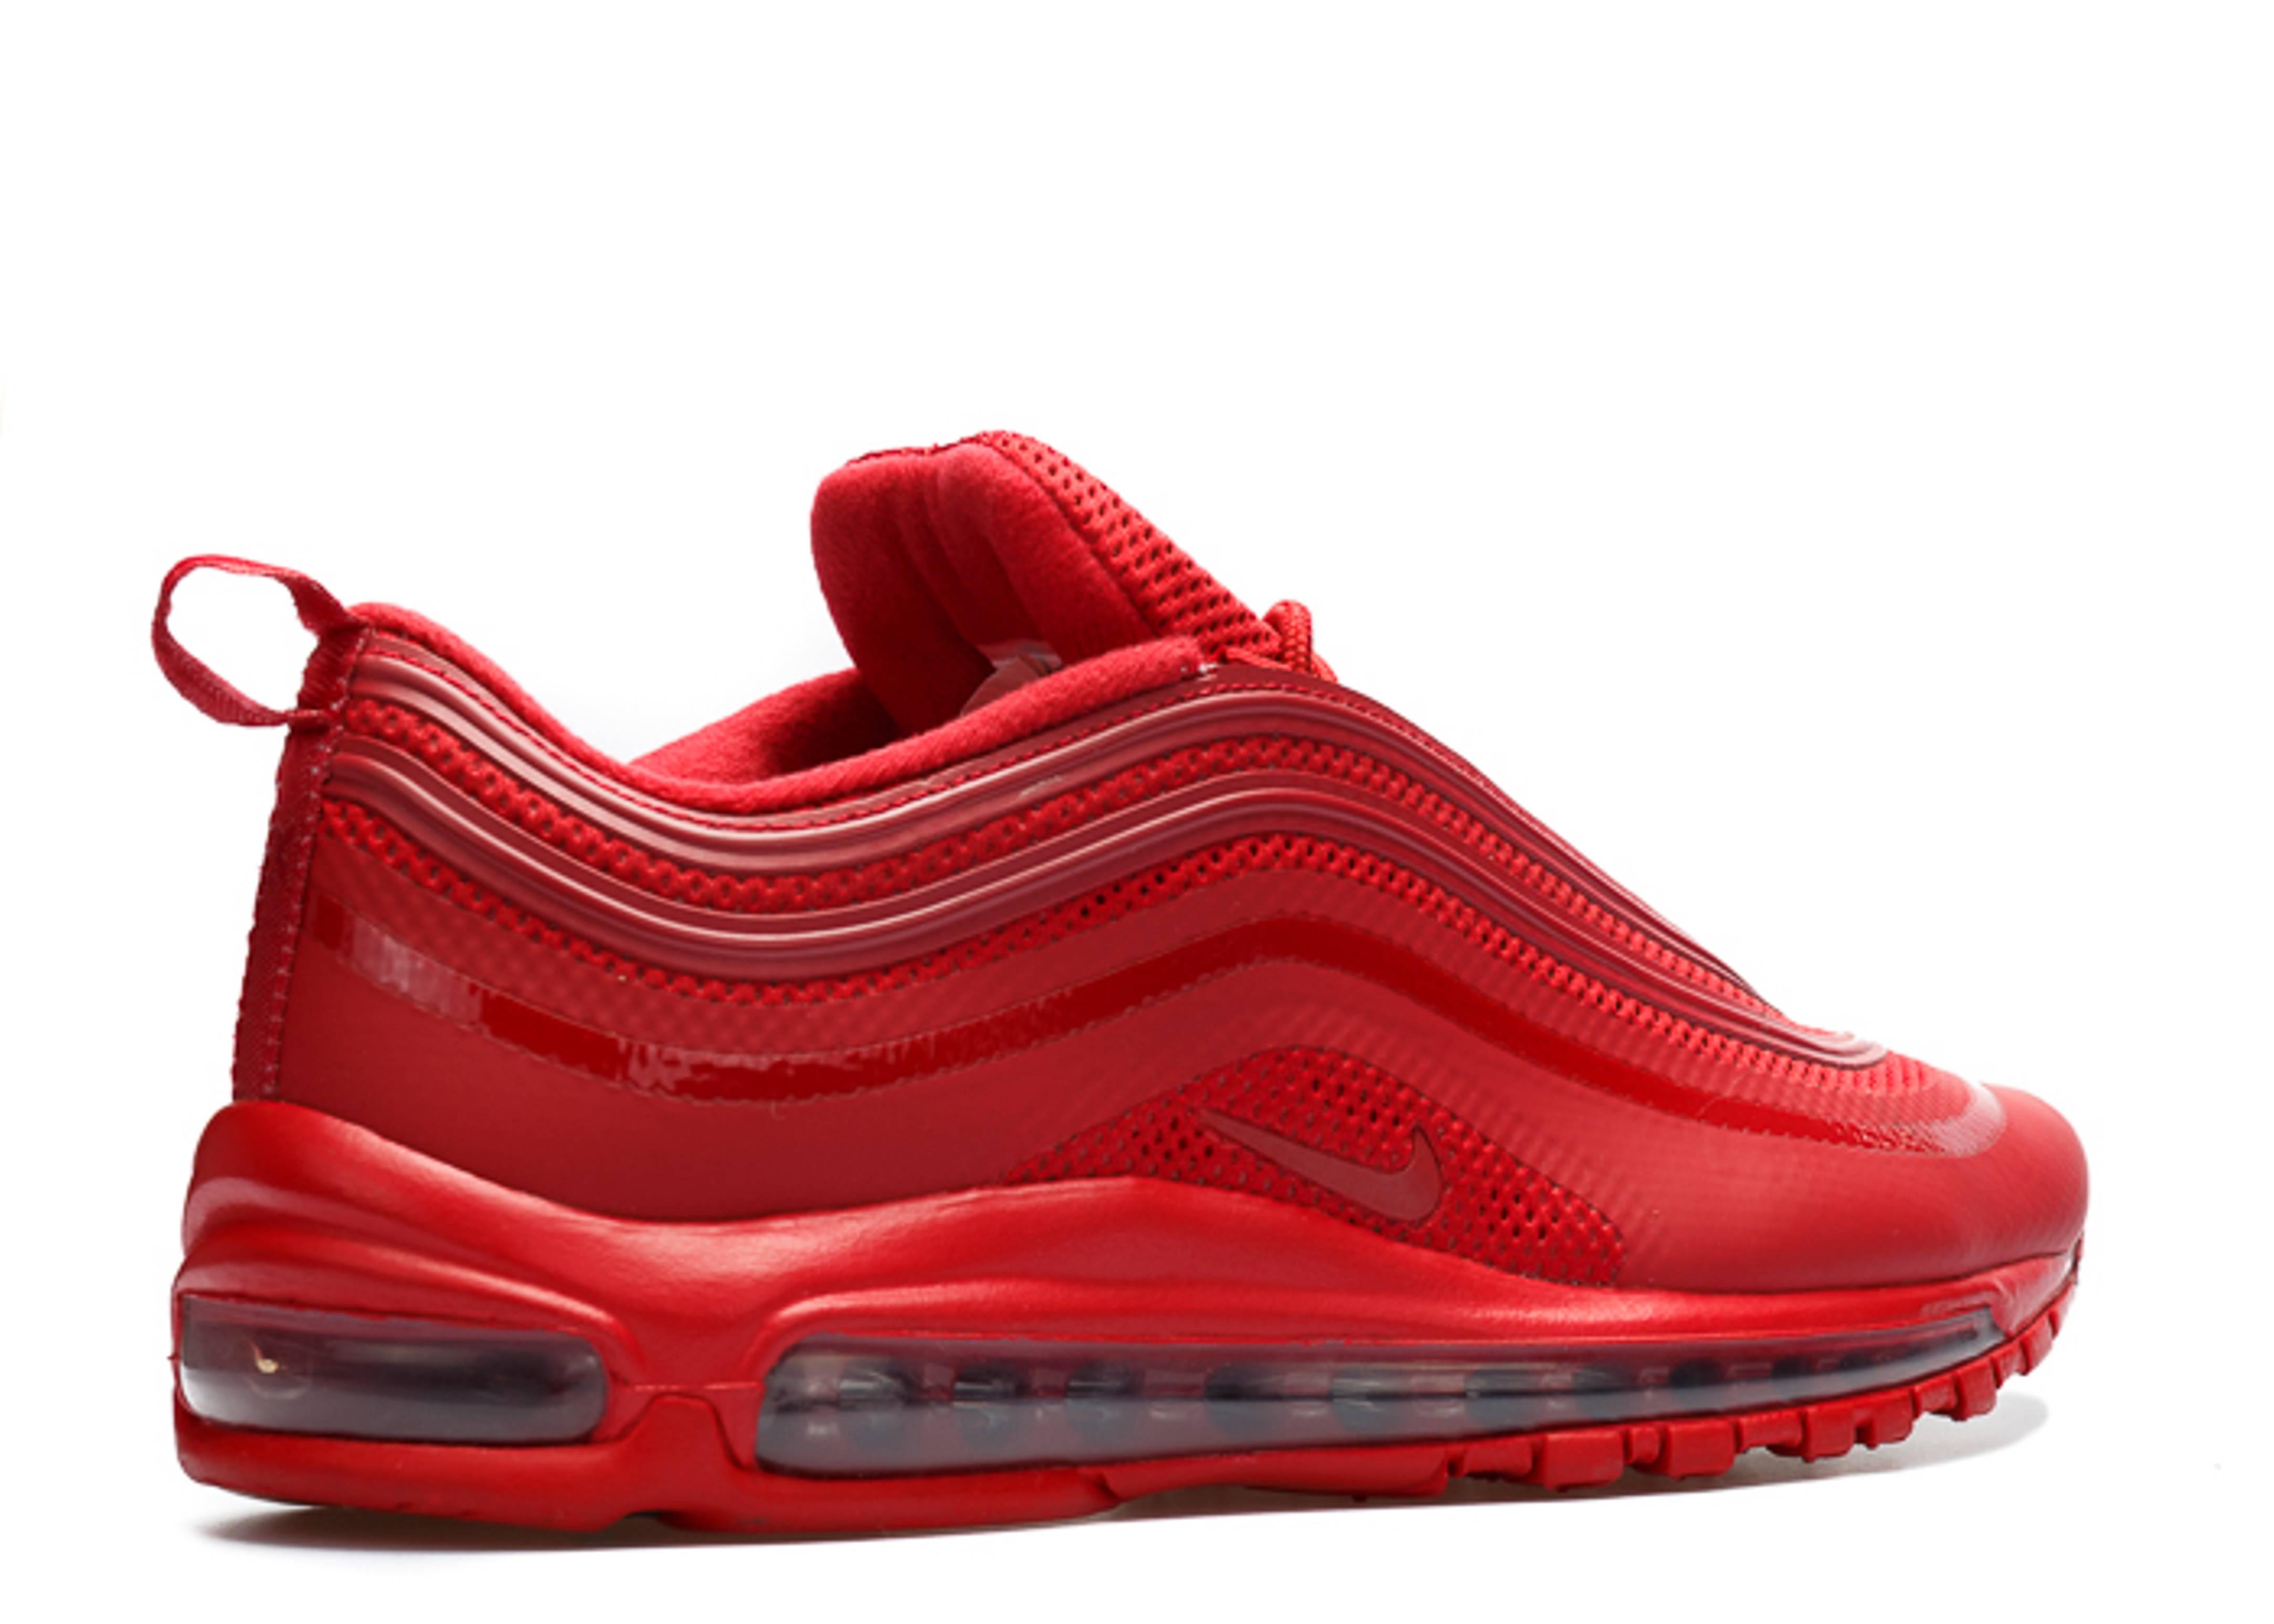 the latest 07483 c572d Air Max 97 Hyperfuse - Nike - 518160 661 - gym red gym red-black-ntrl gry   Flight  Club